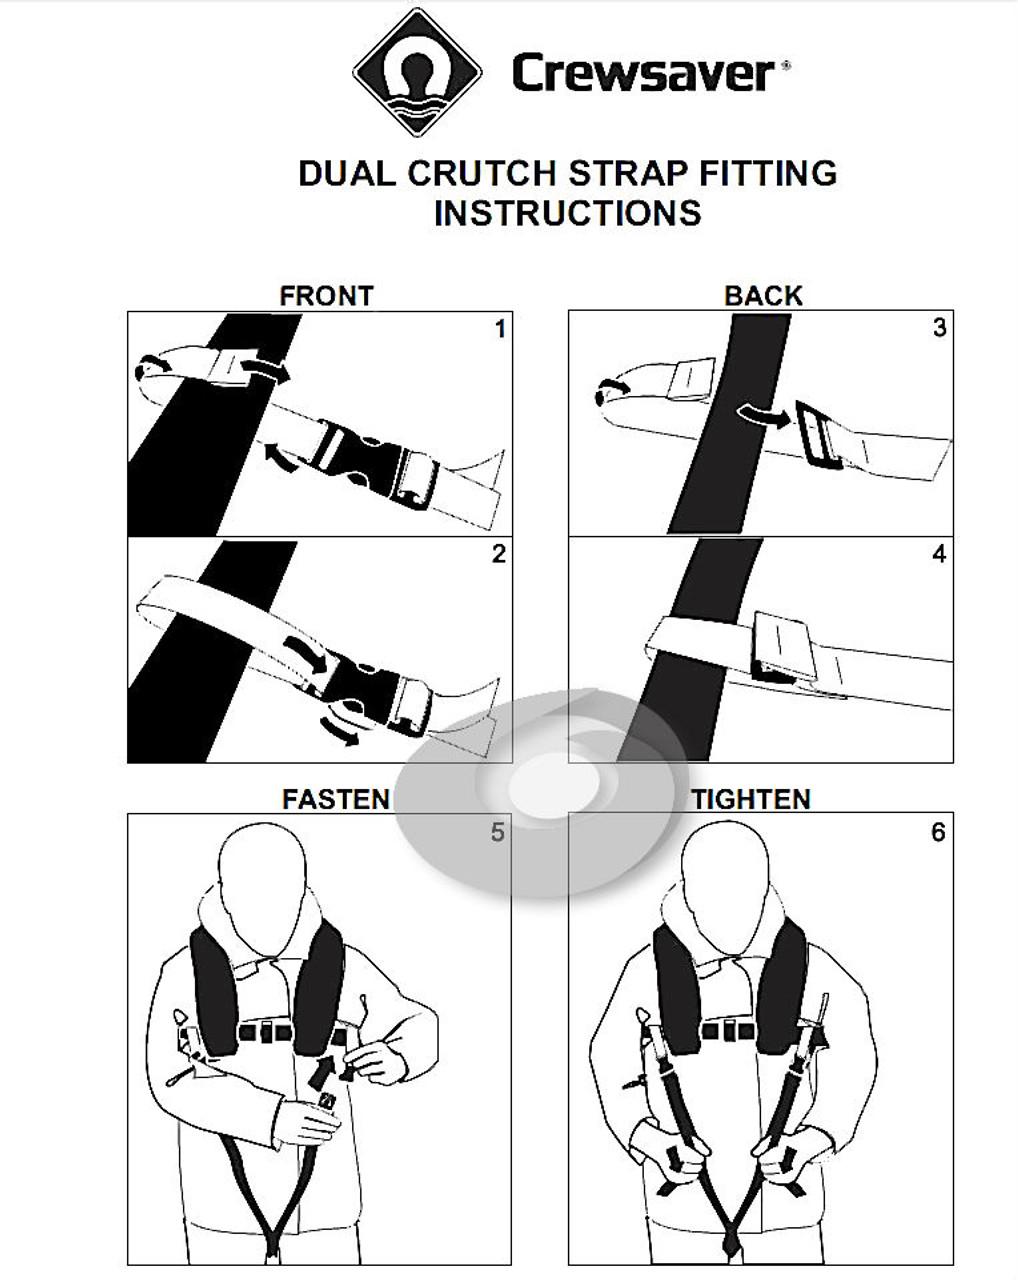 Life Jacket Crewsaver Crewfit Universal Dual Crotch Strap